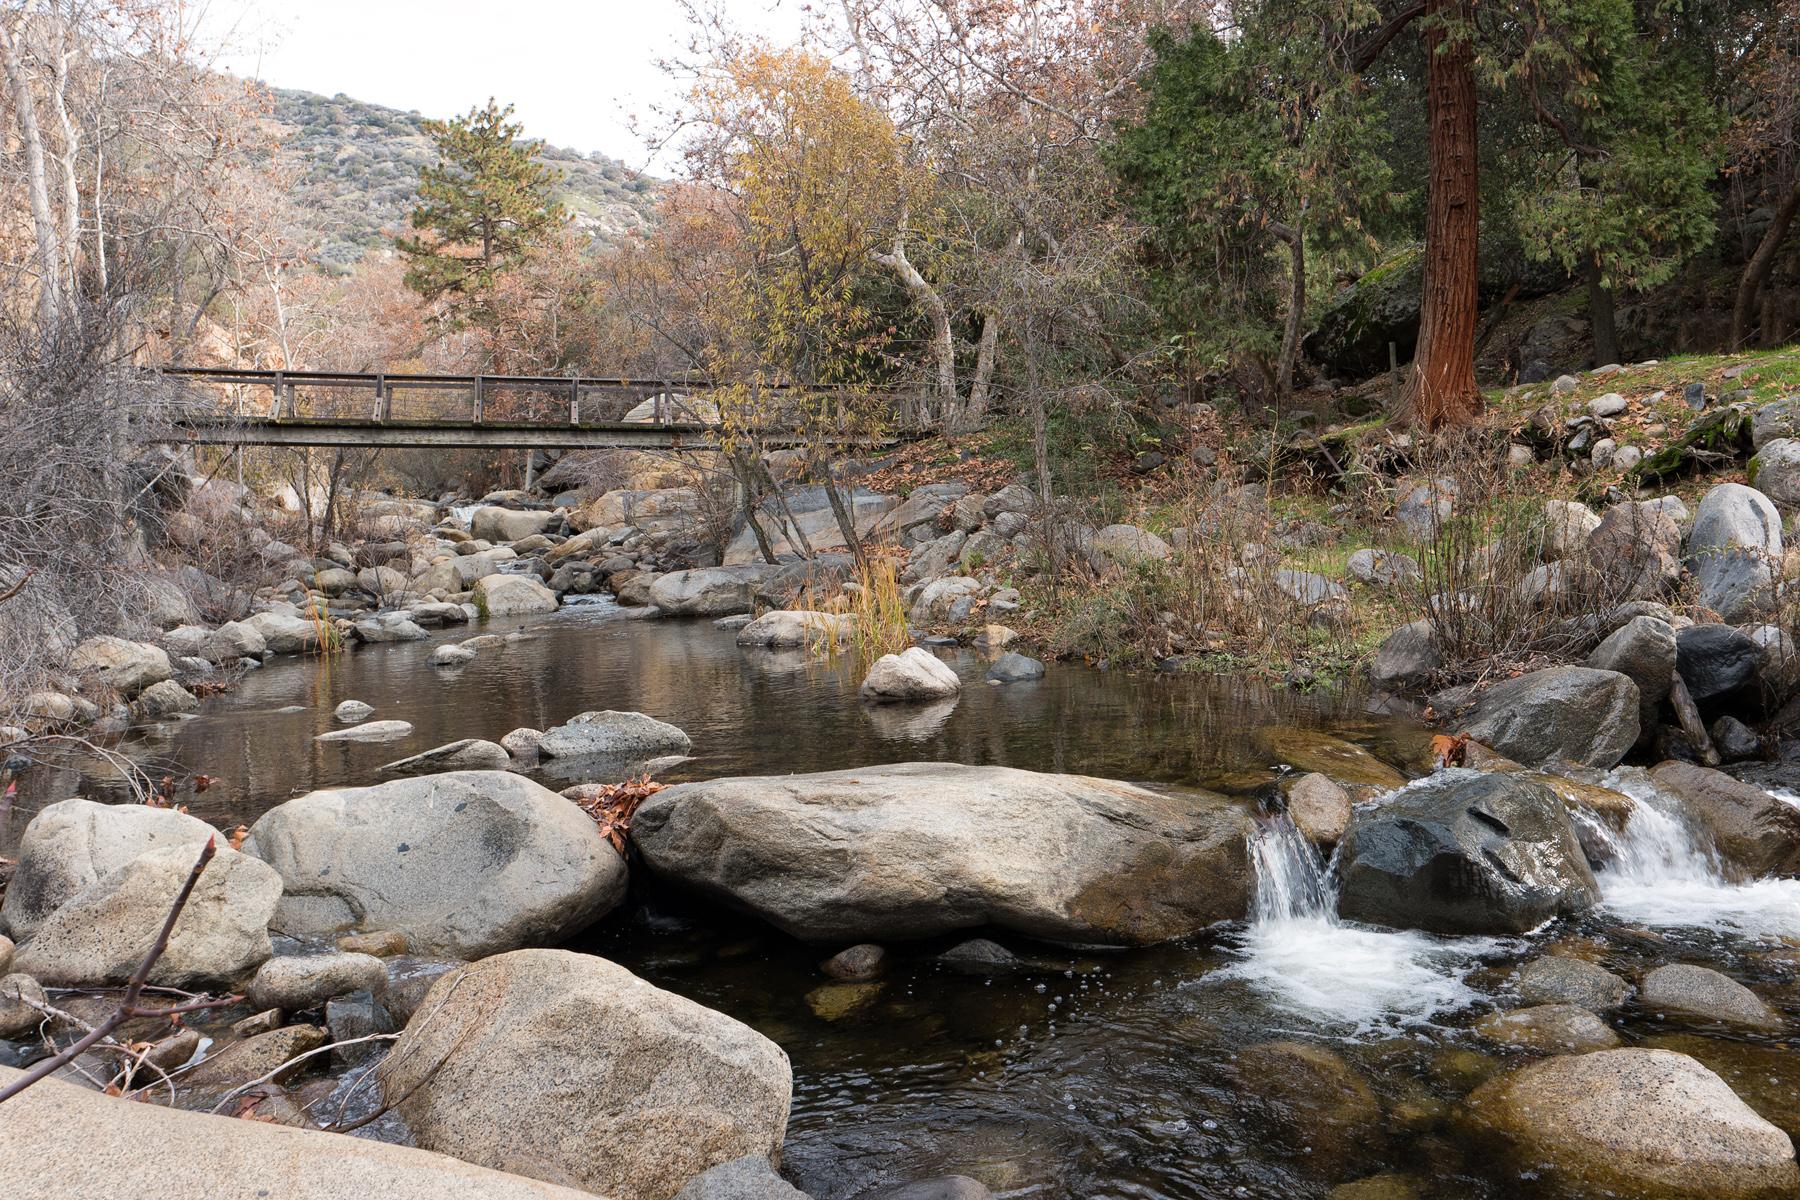 Wasim Muklashy Photography_Sequoia National Park_California_December 2015_-SAM_4688-Edit.jpg